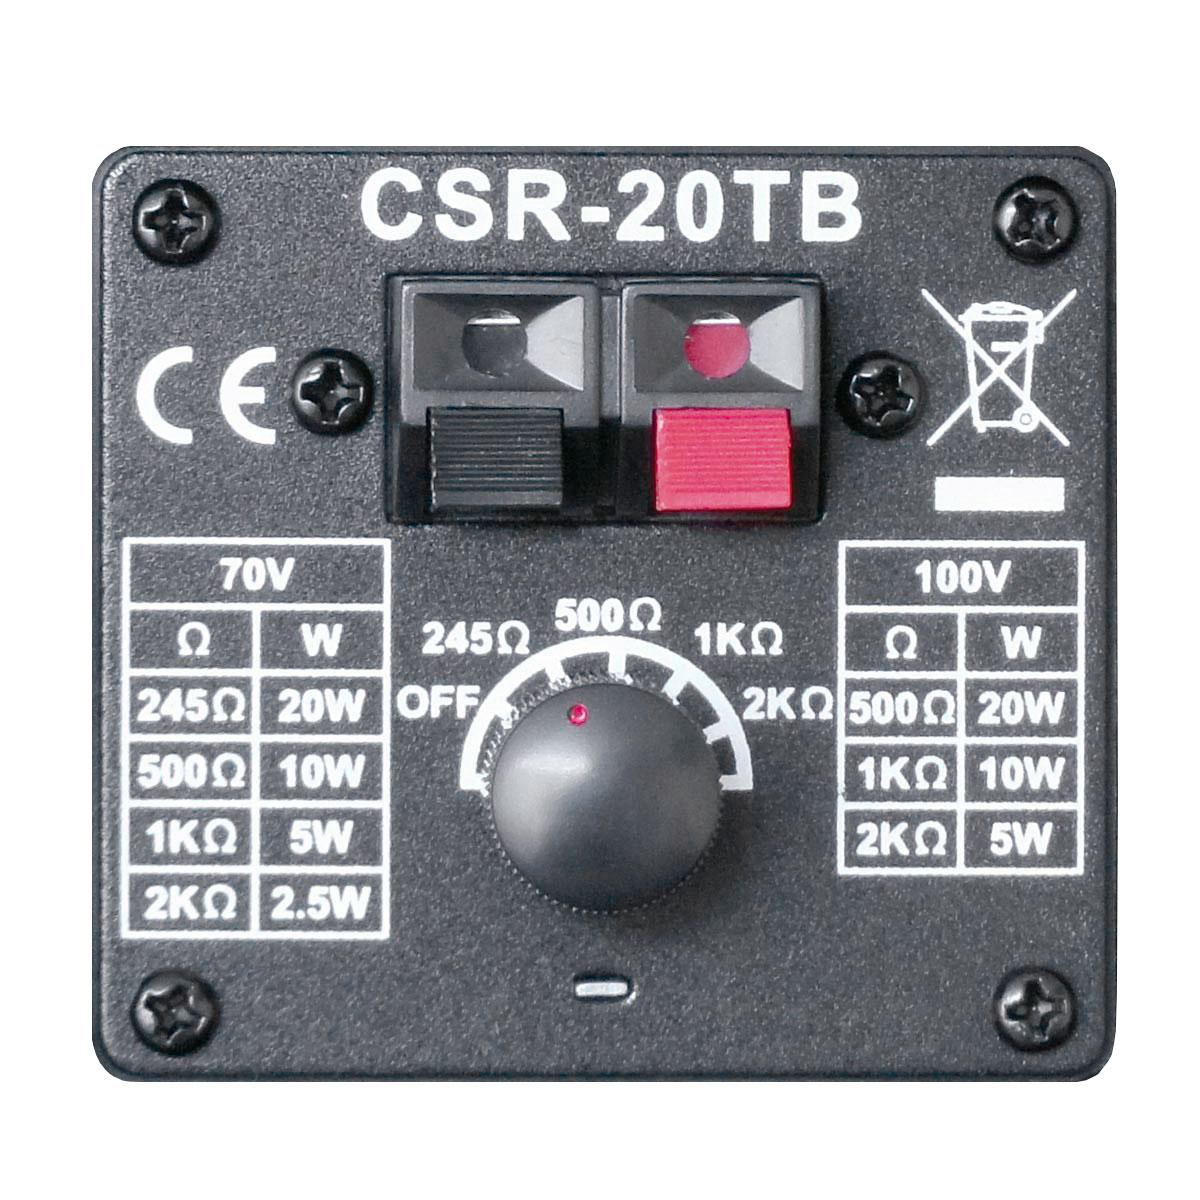 CSR20TB - Caixa Passiva 20W Preta c/ Suporte ( Par ) CSR 20 TB - CSR